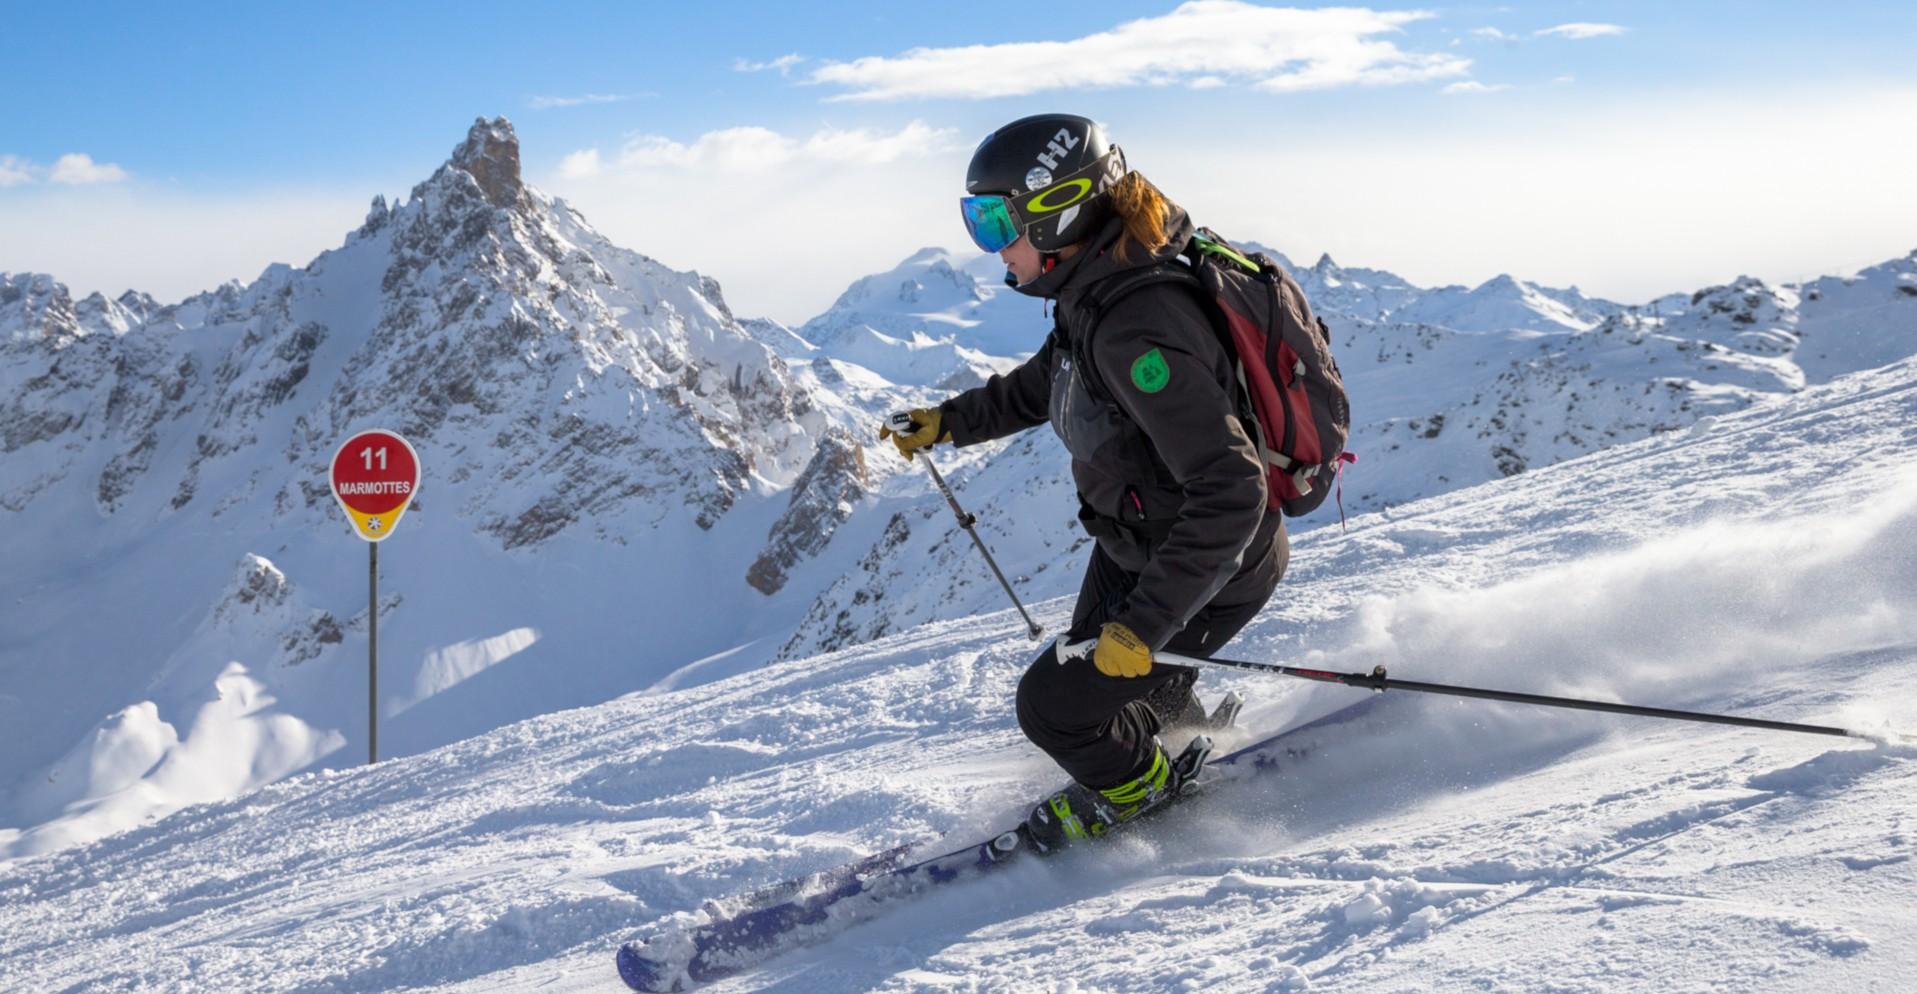 bassedef-actb-ski-alpin-courchevel-hiver17-05-303